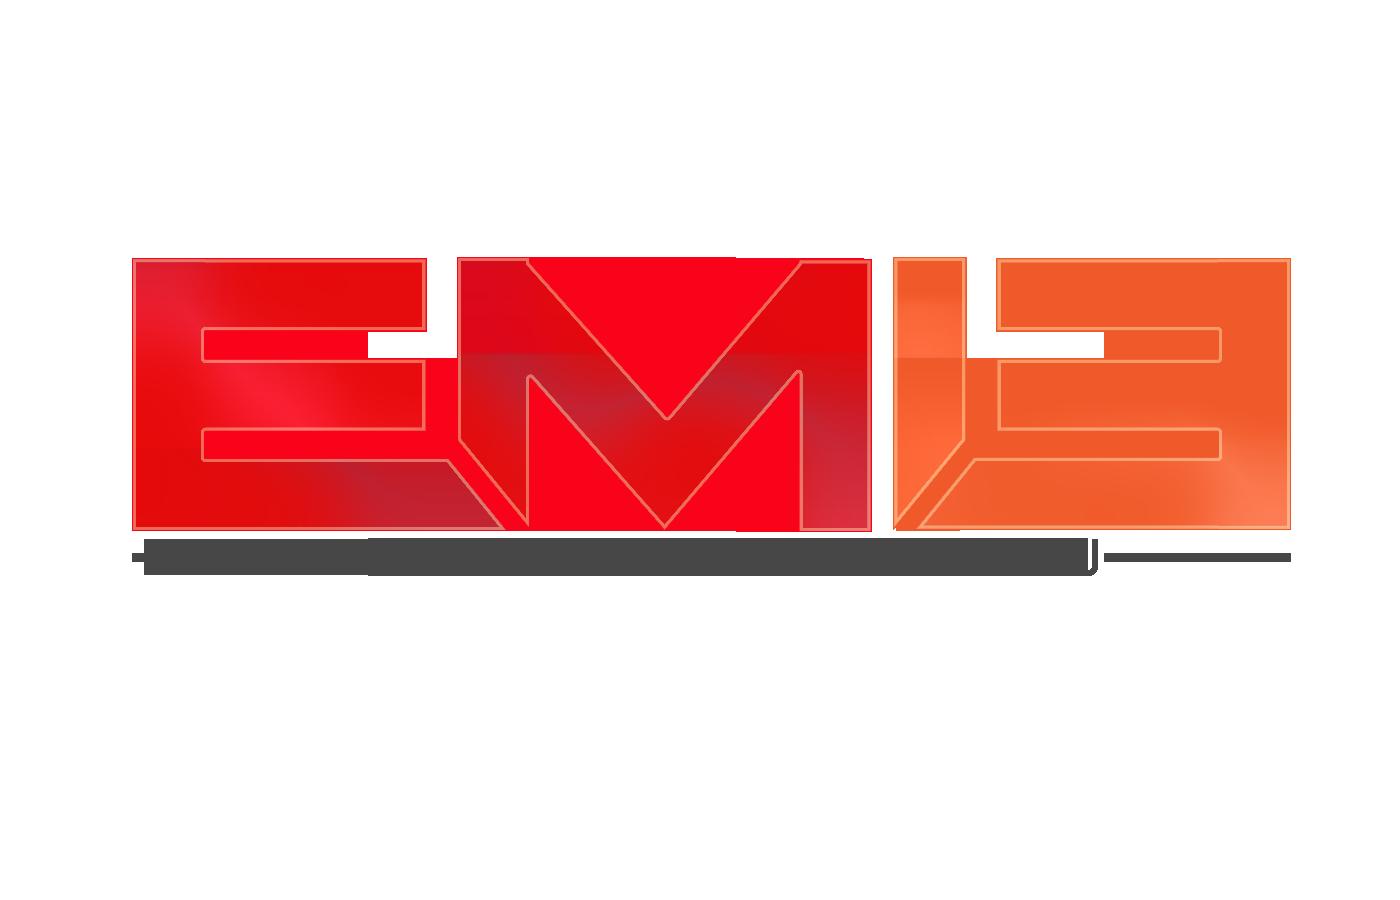 EM13 Email That Drives Revenues